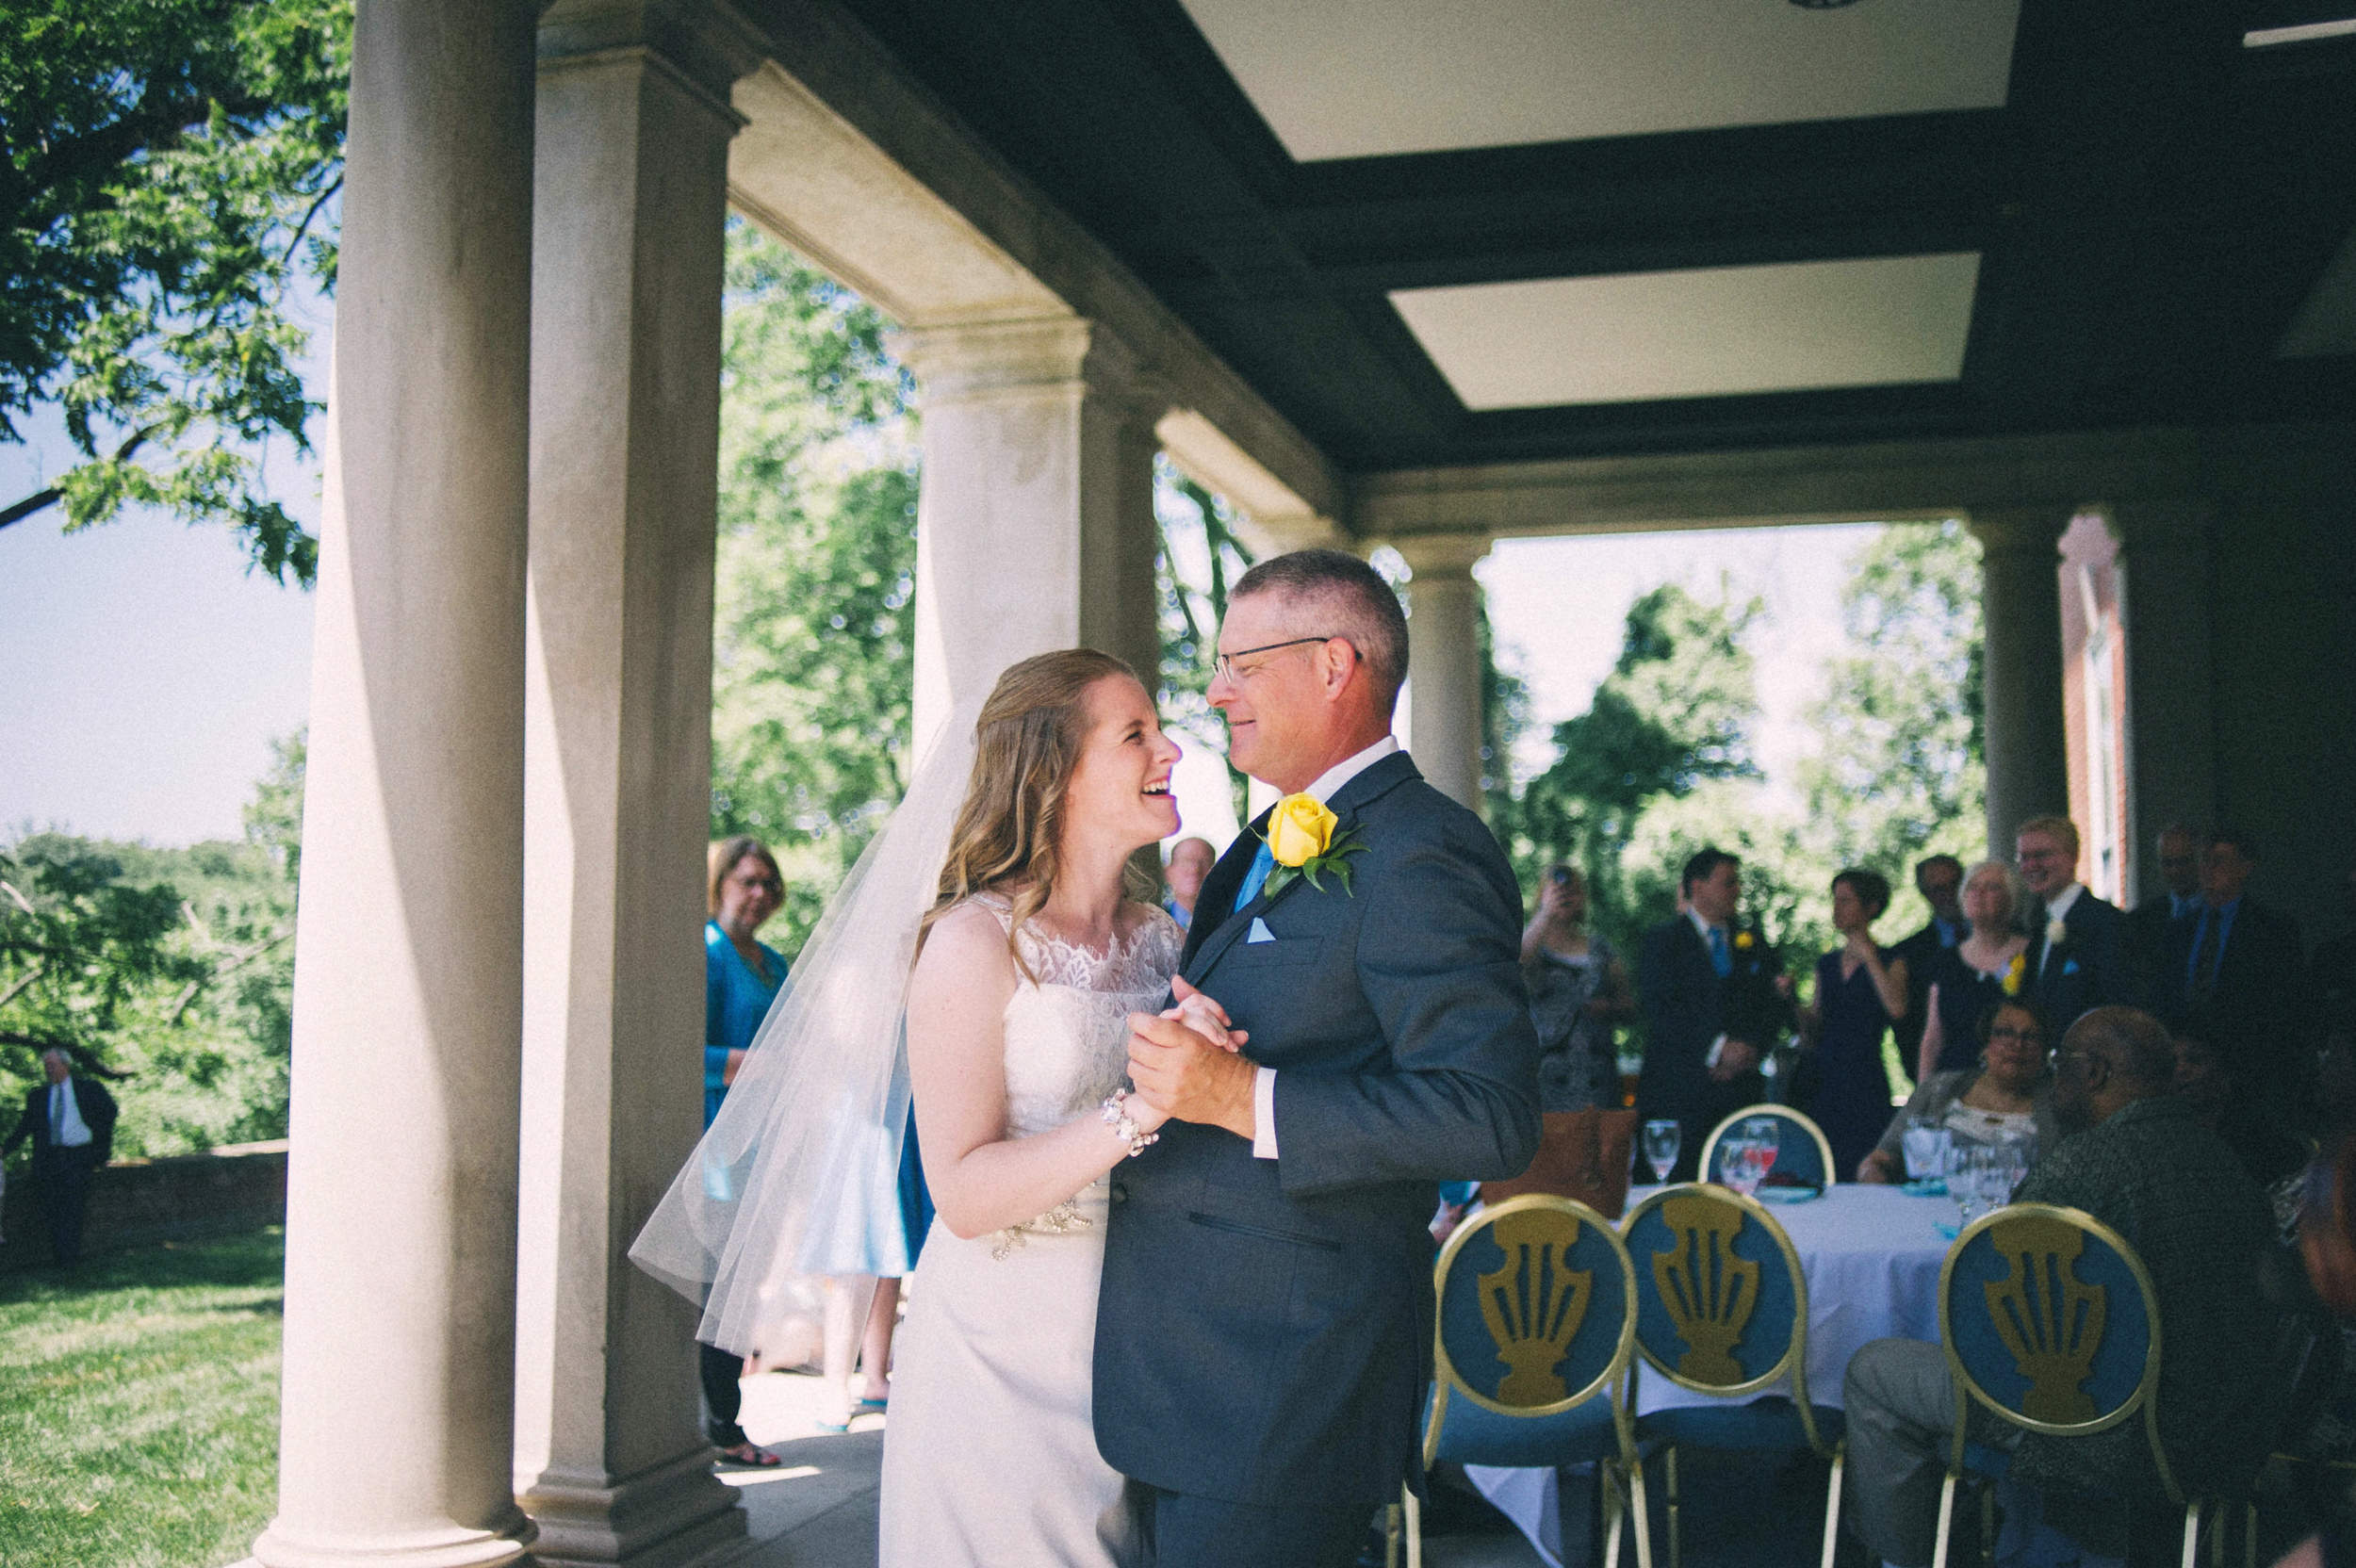 Jenna-Patrick-Garden-Court-Presbyterian-Seminary-Wedding-Louisville-Kentucky-Sarah-Katherine-Davis-Photography-67.jpg